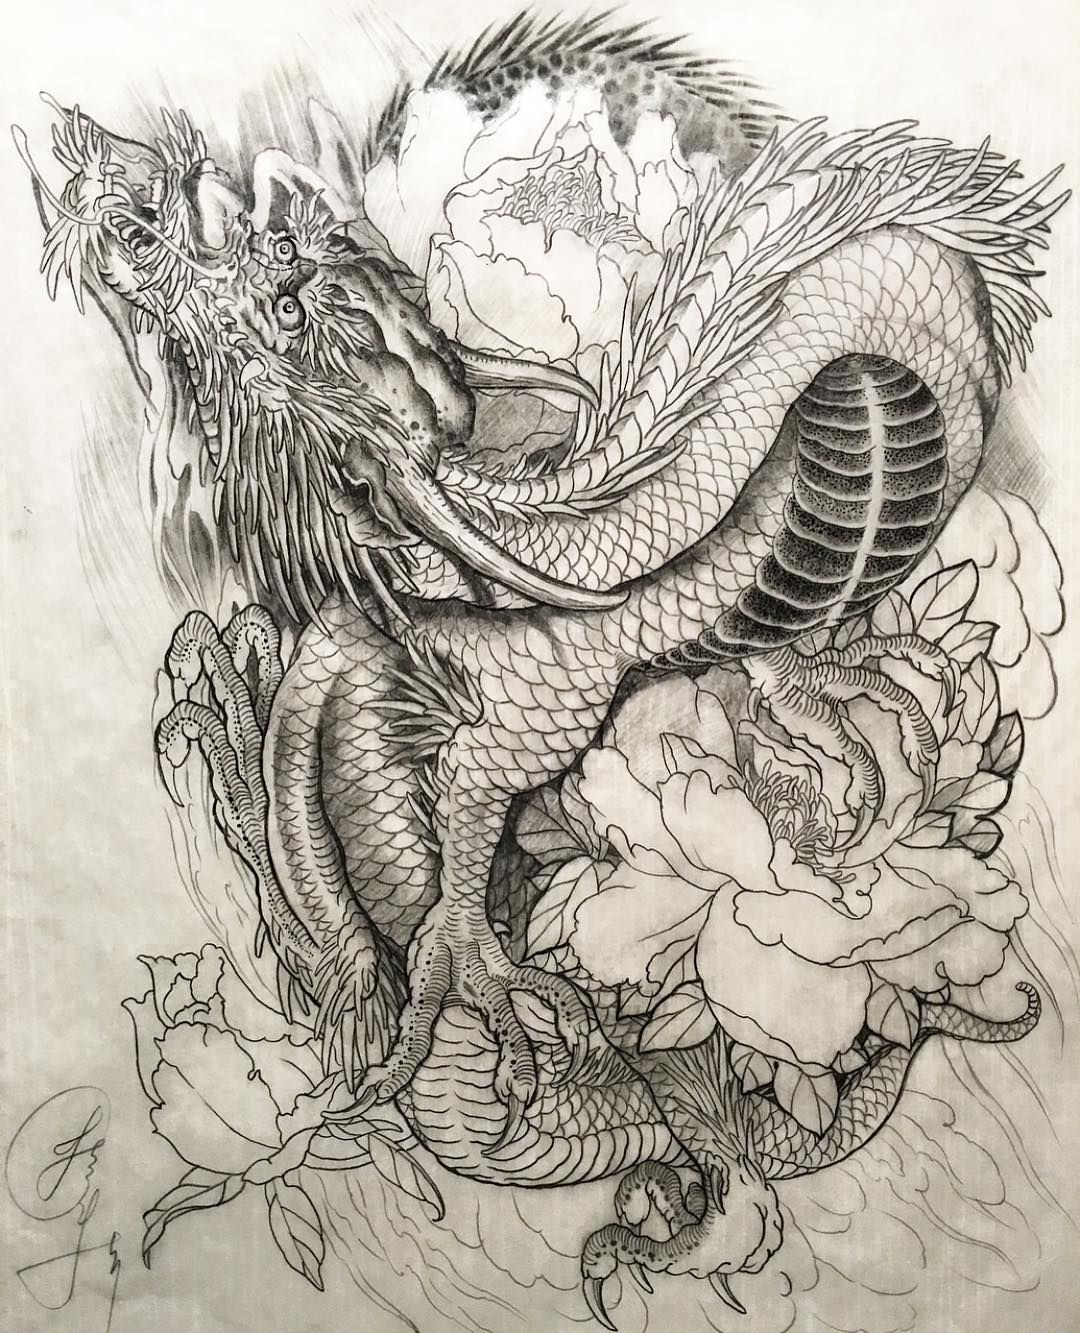 Tattoo Designs Kochi: 入れ墨, ドラゴン 및 タトゥー